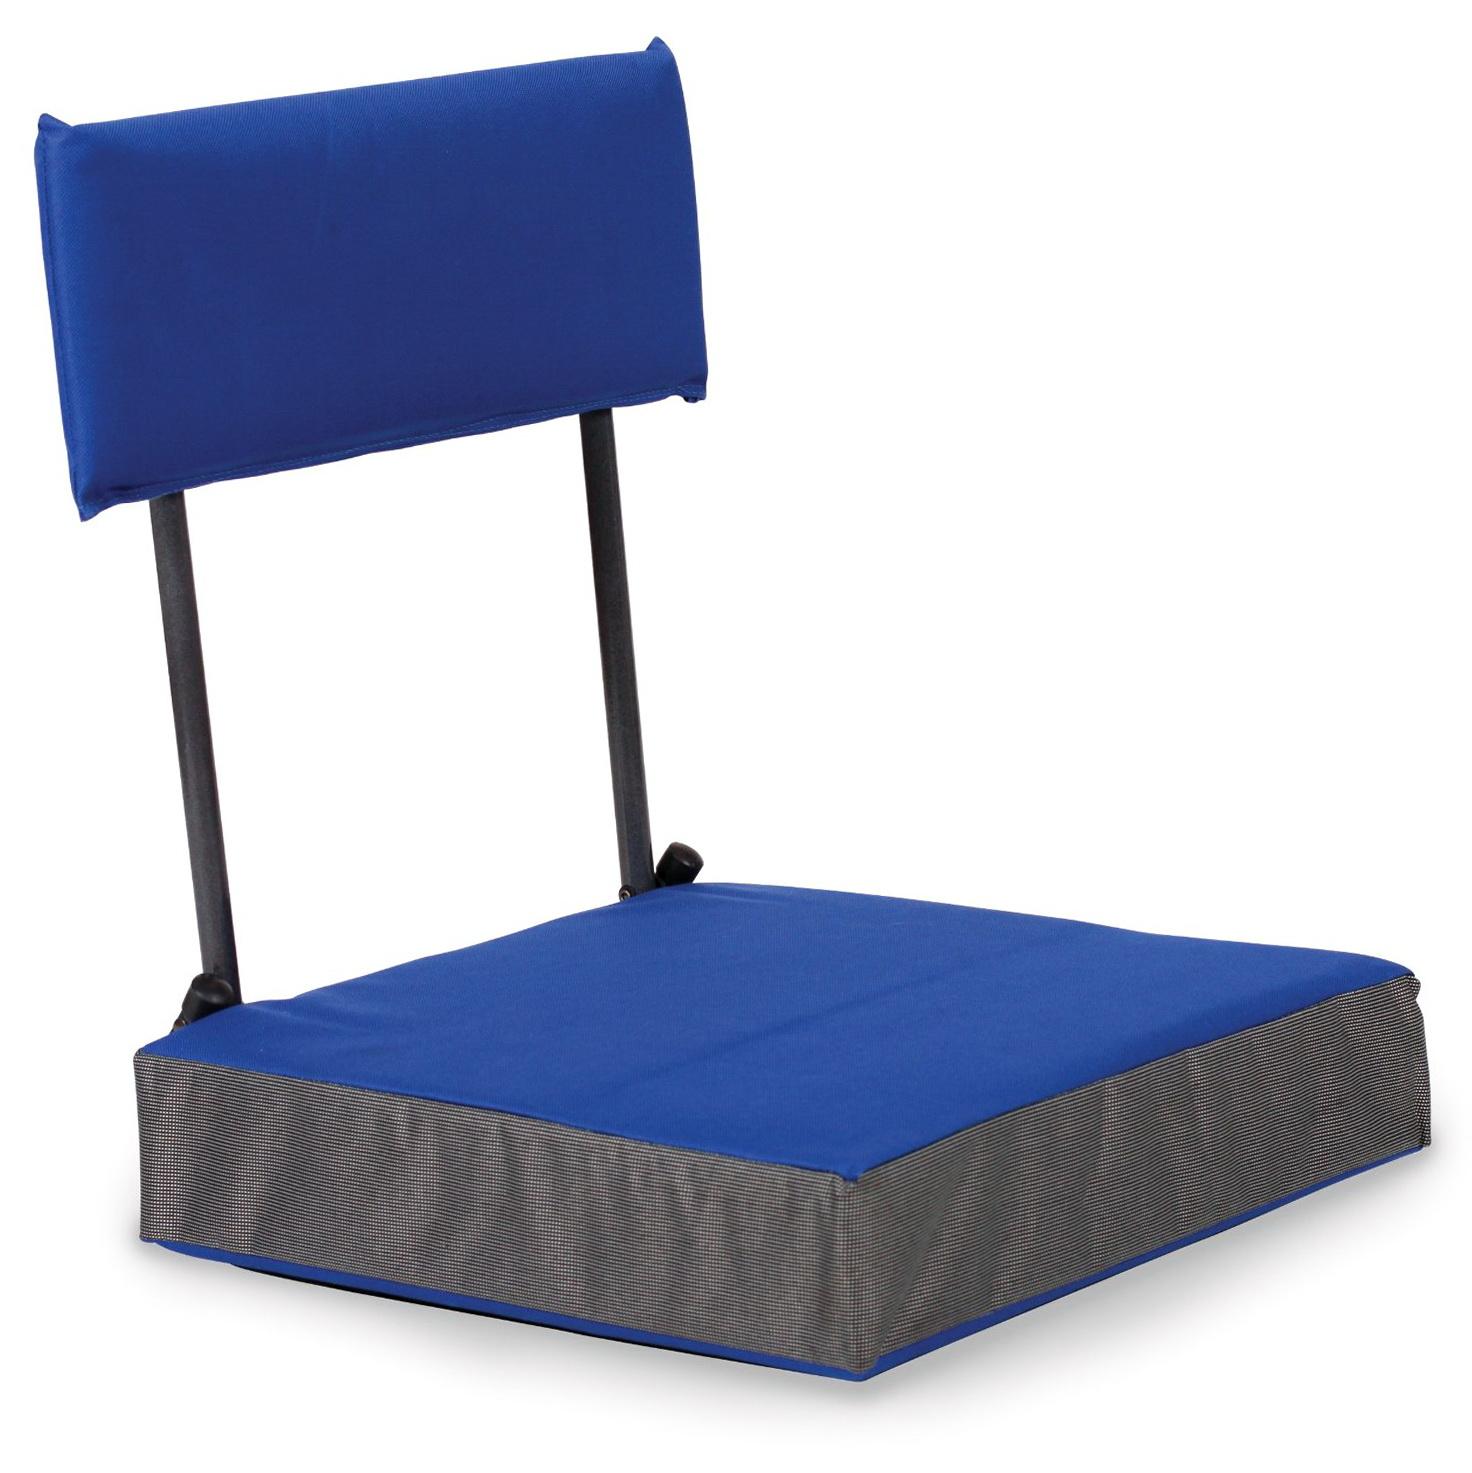 Inflatable Stadium Seat Cushion Home Design Ideas